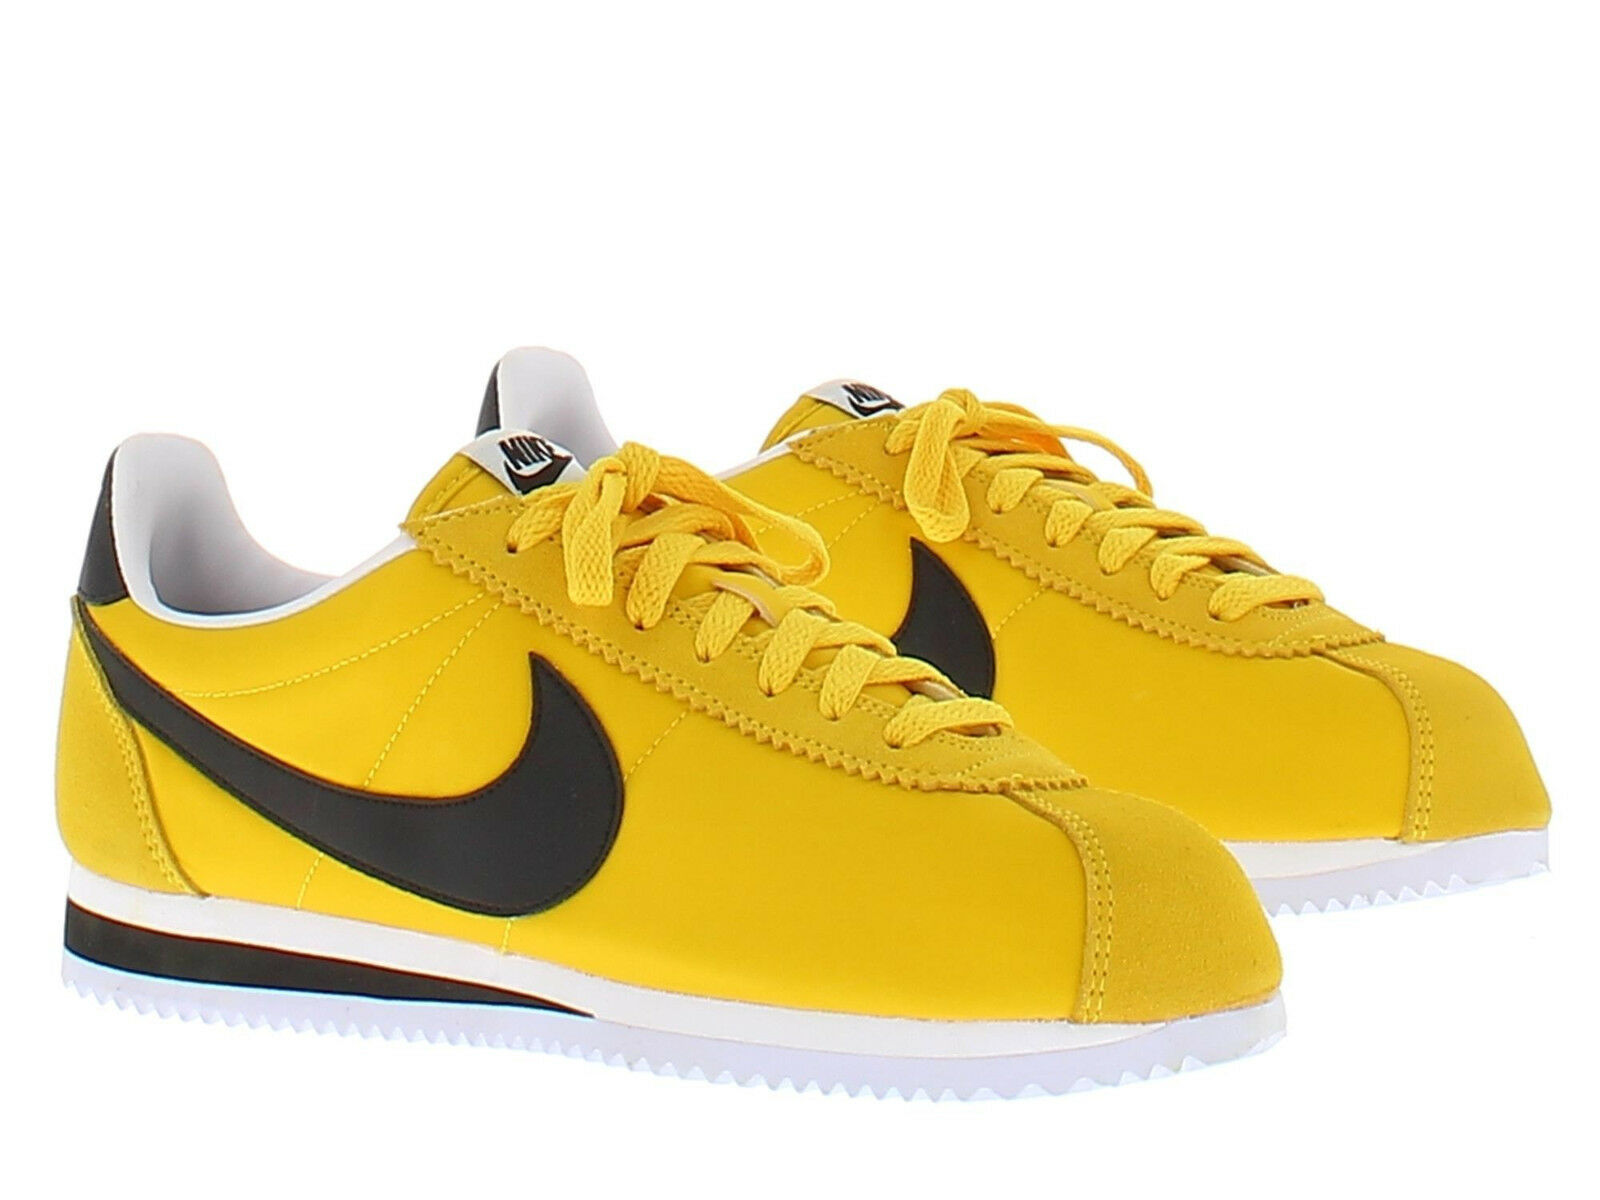 Nike classic nylon gelb größe 12  cortez in